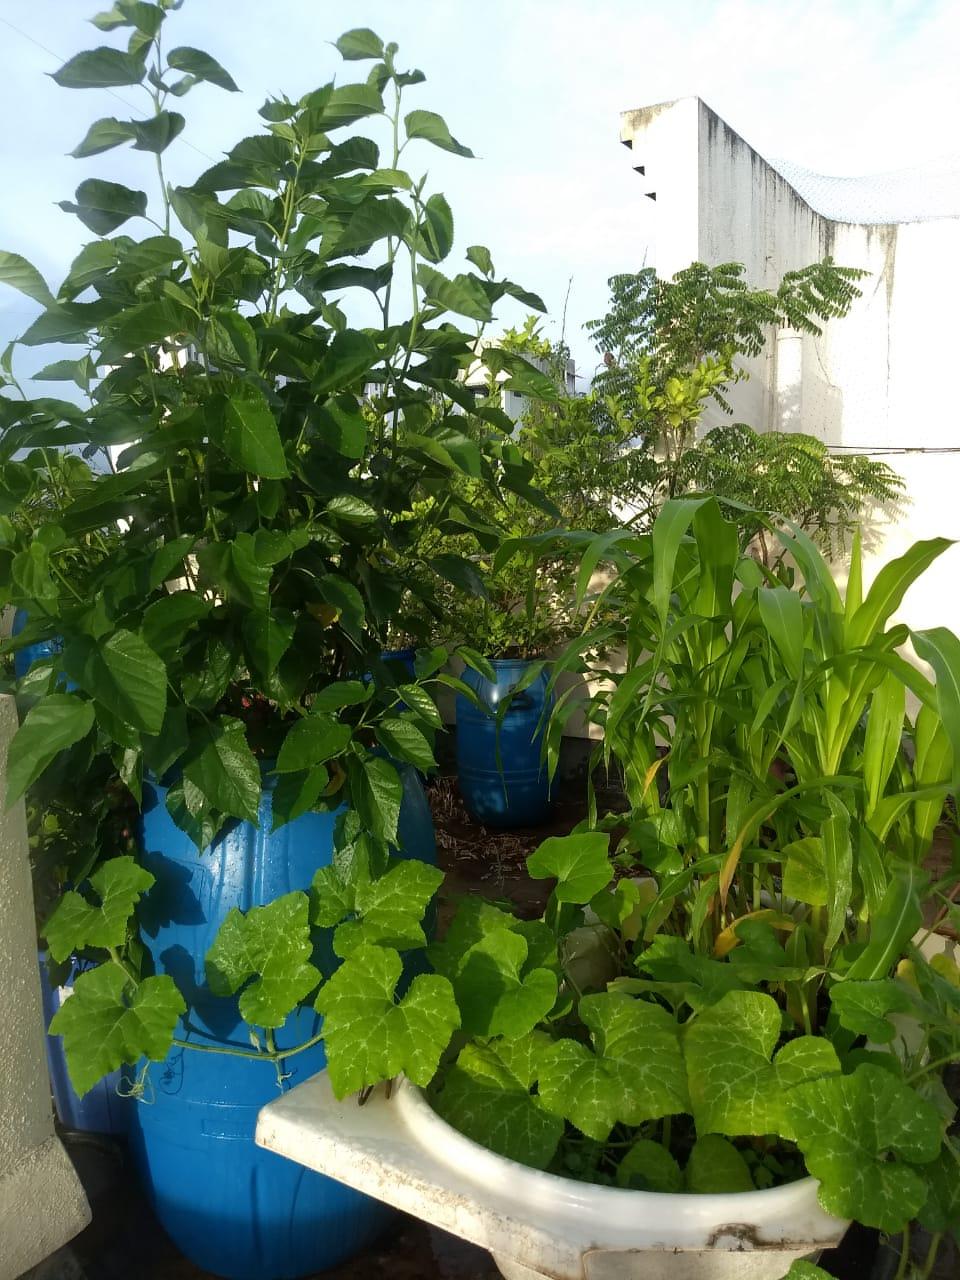 A green plant in a garden  Description automatically generated